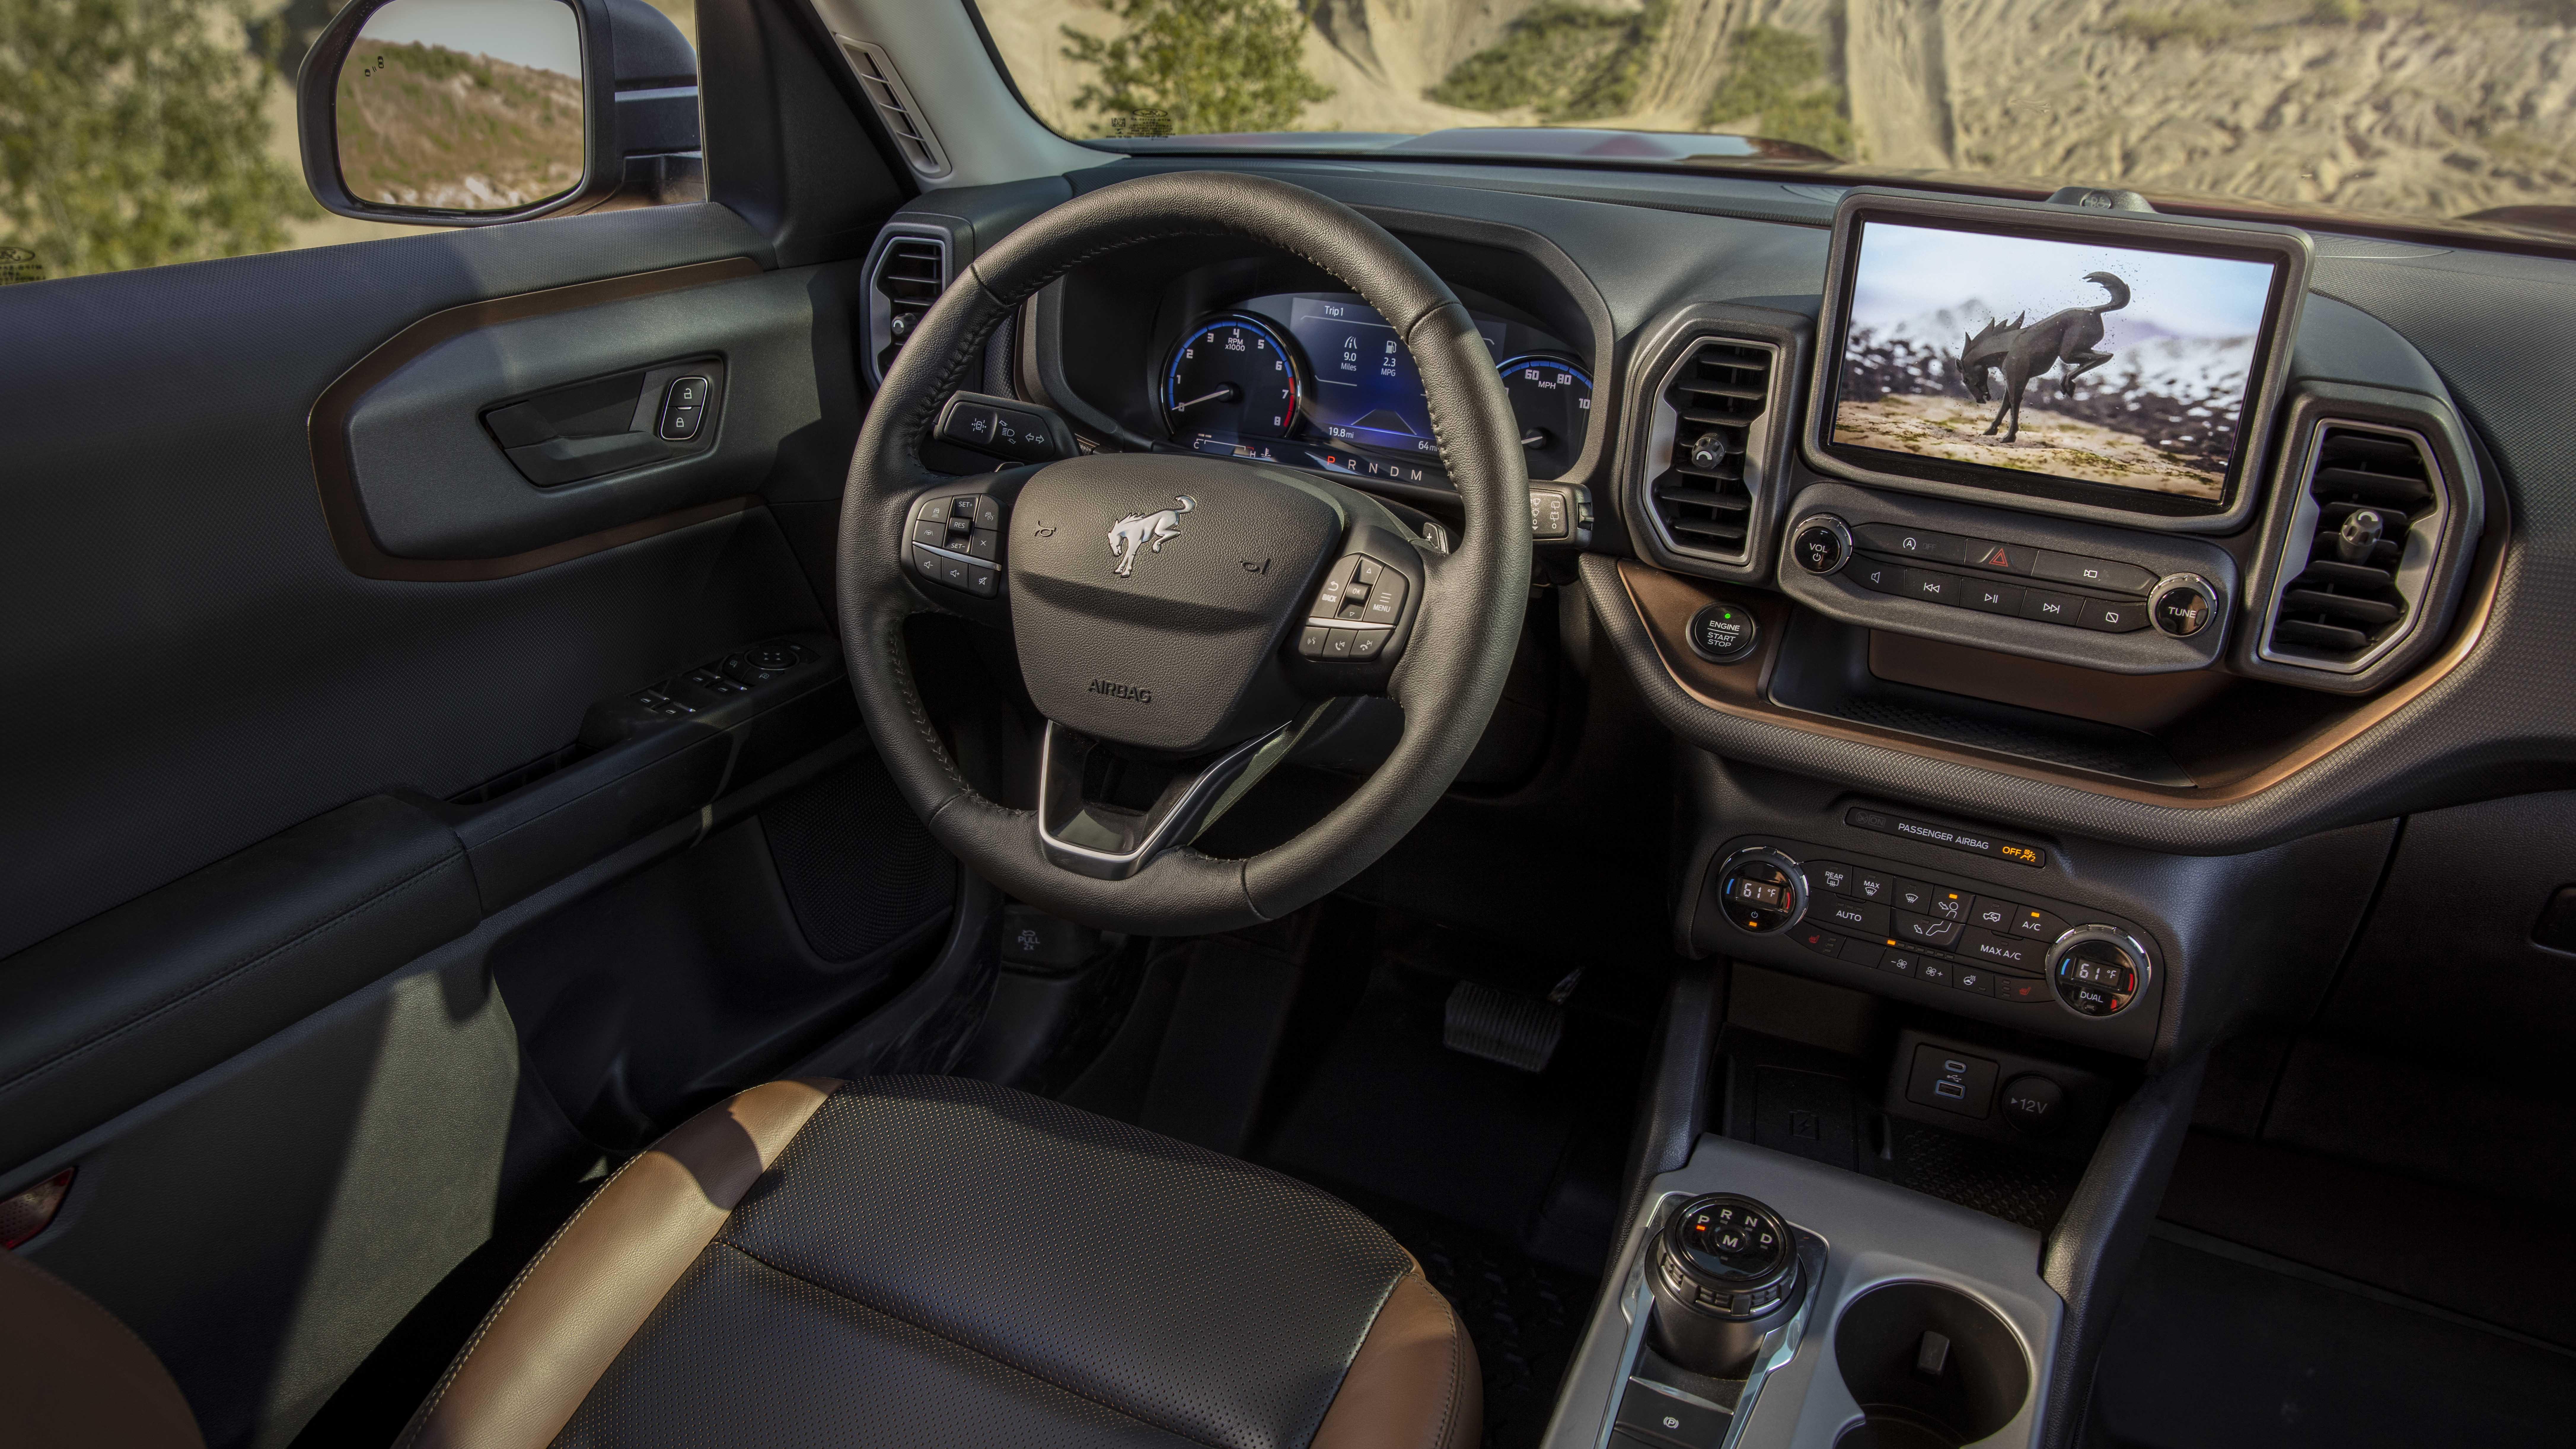 2021 Ford Bronco Sport Interior Photo Gallery Autoblog